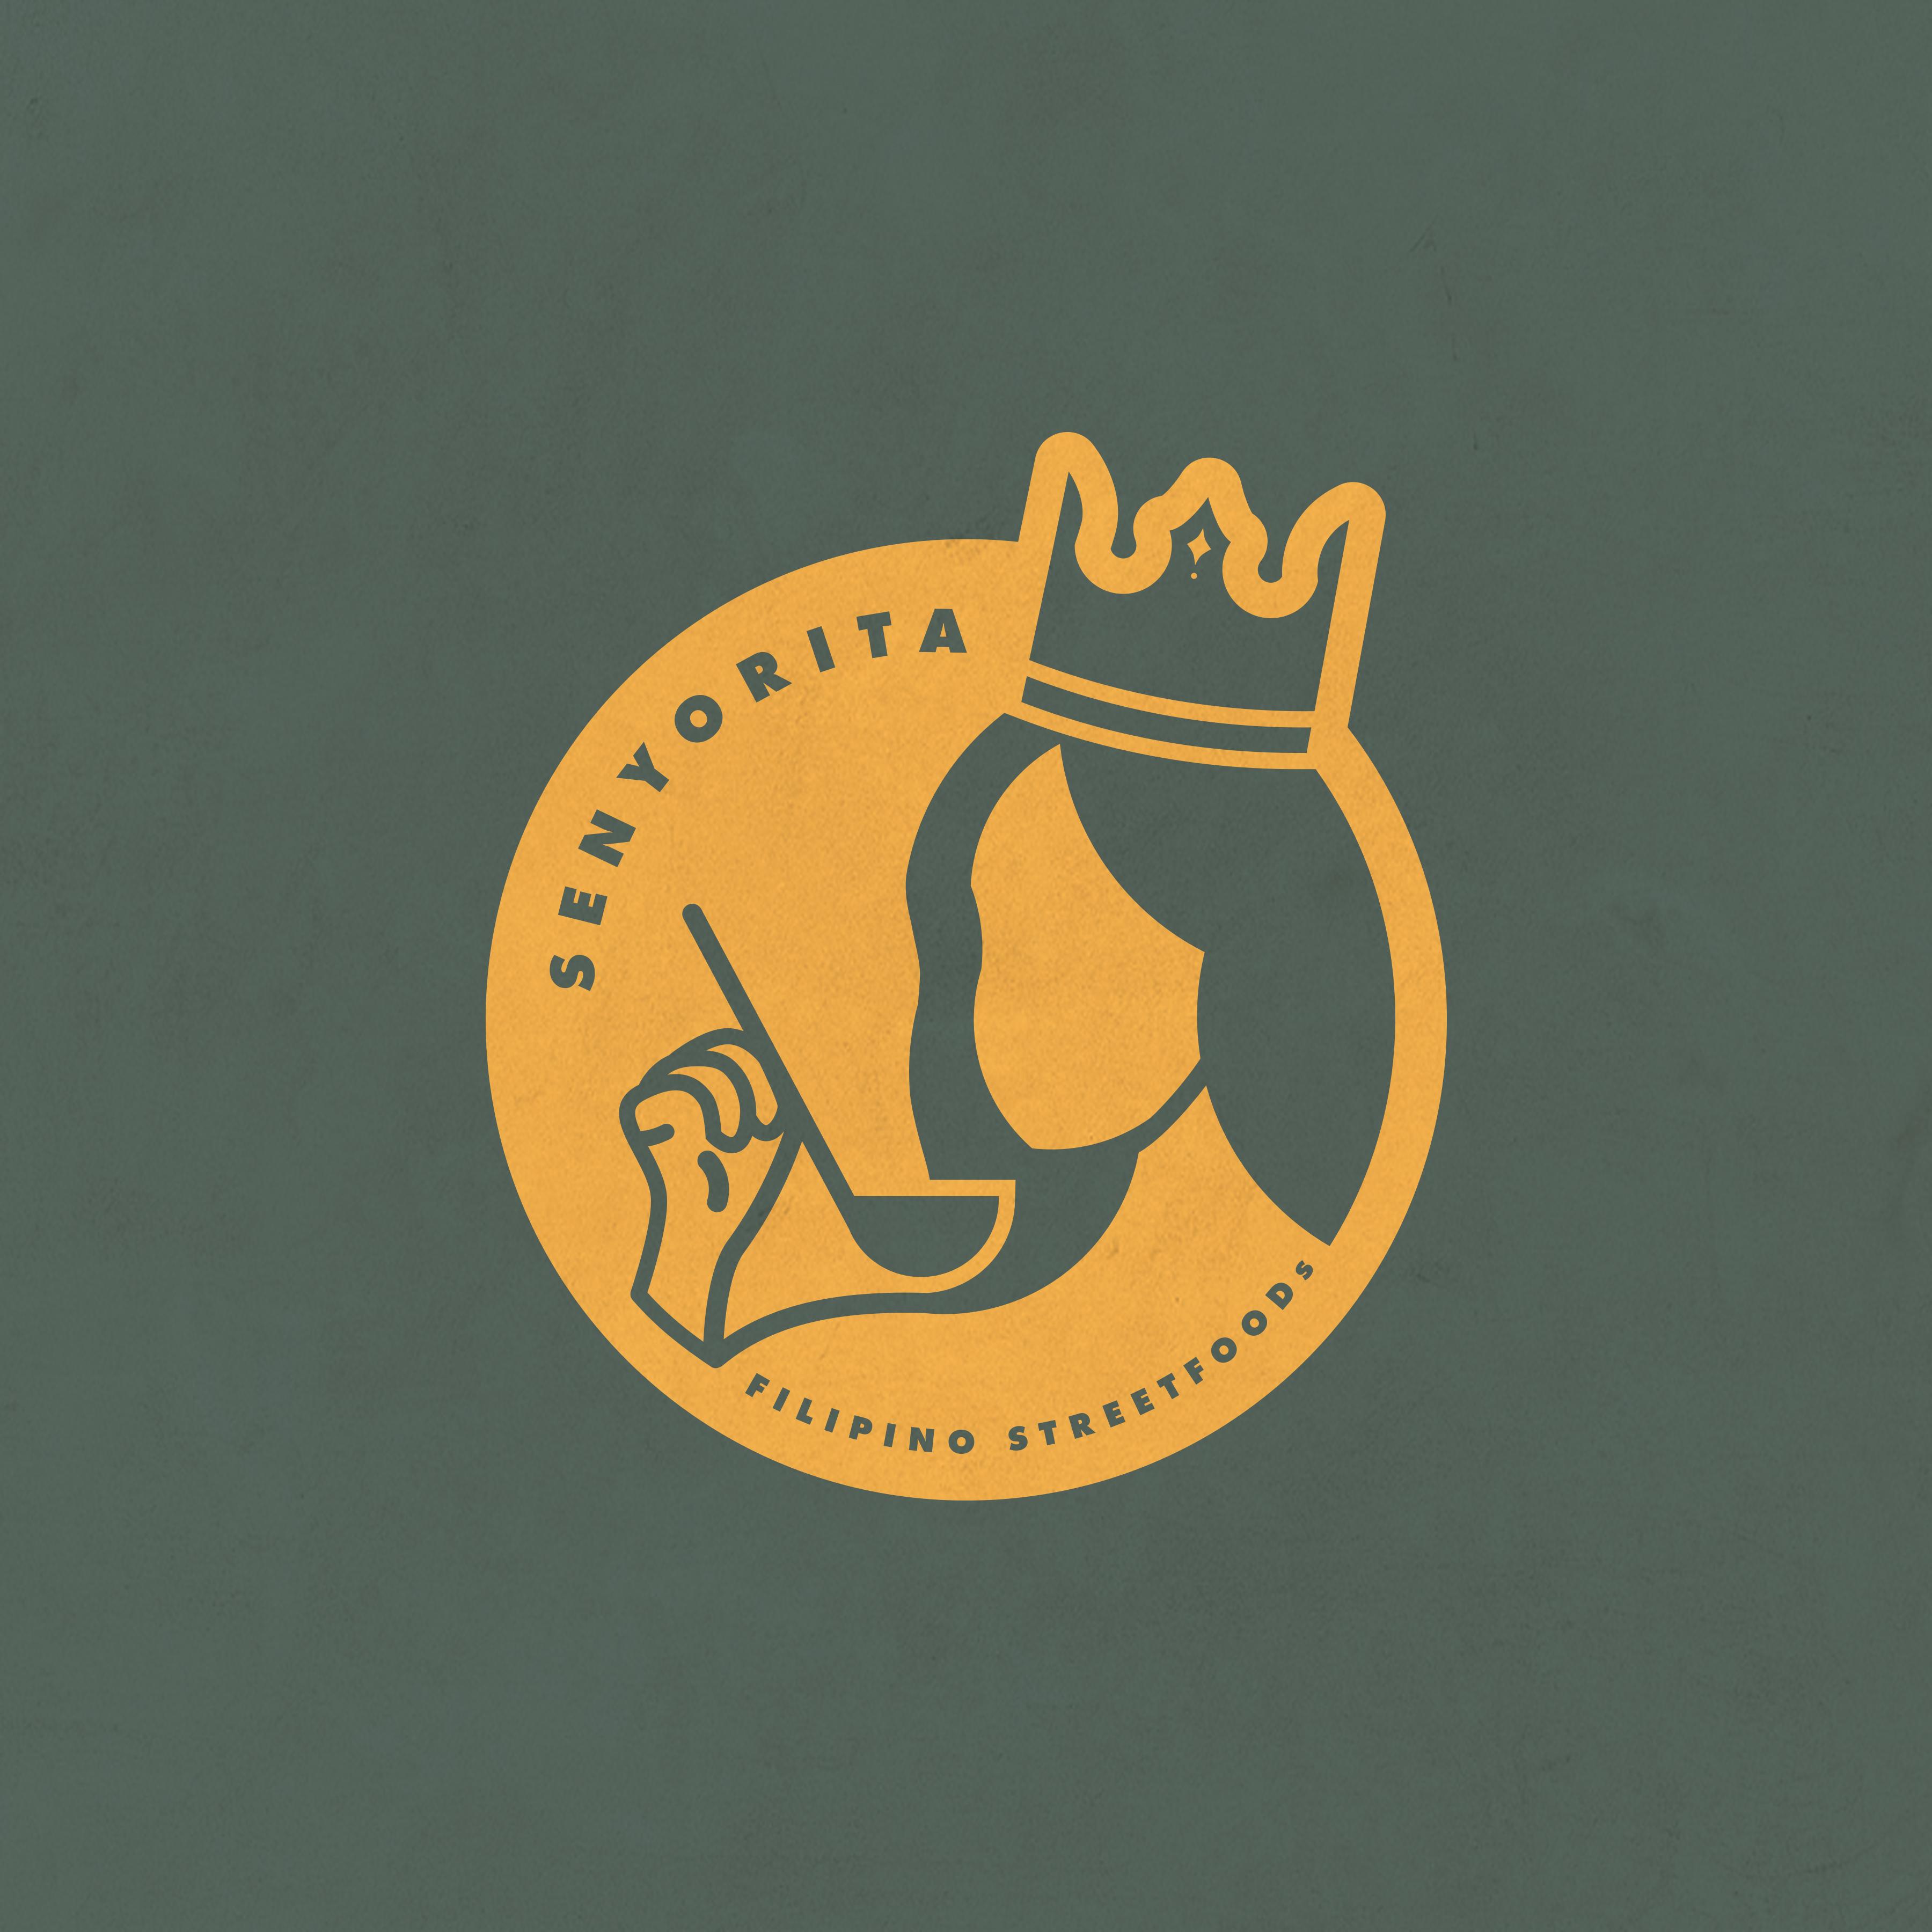 ANerdsWorld_Logos_Senyorita